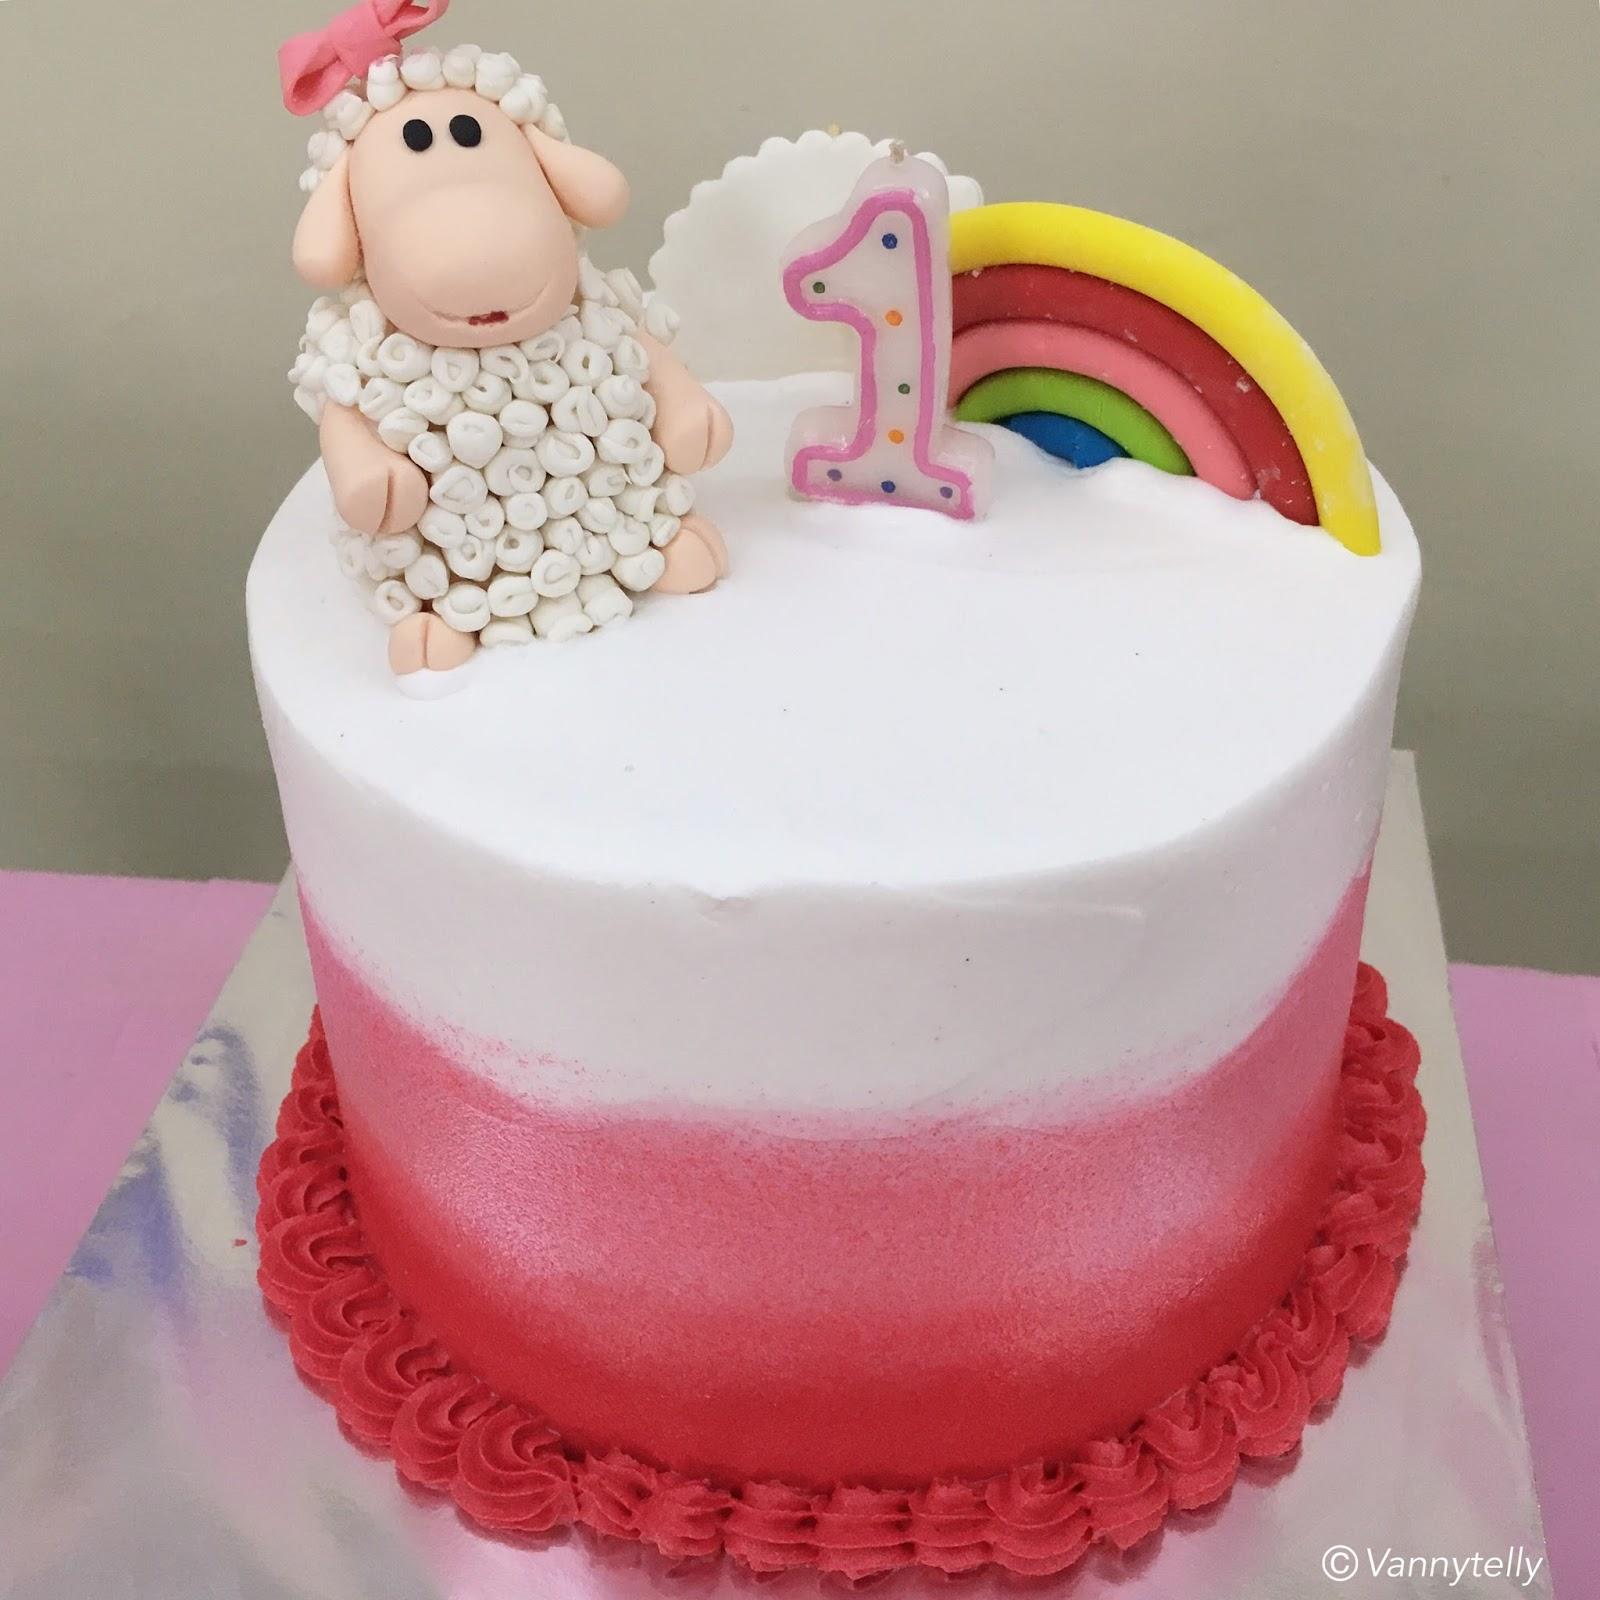 Birthday Options Besides Cake